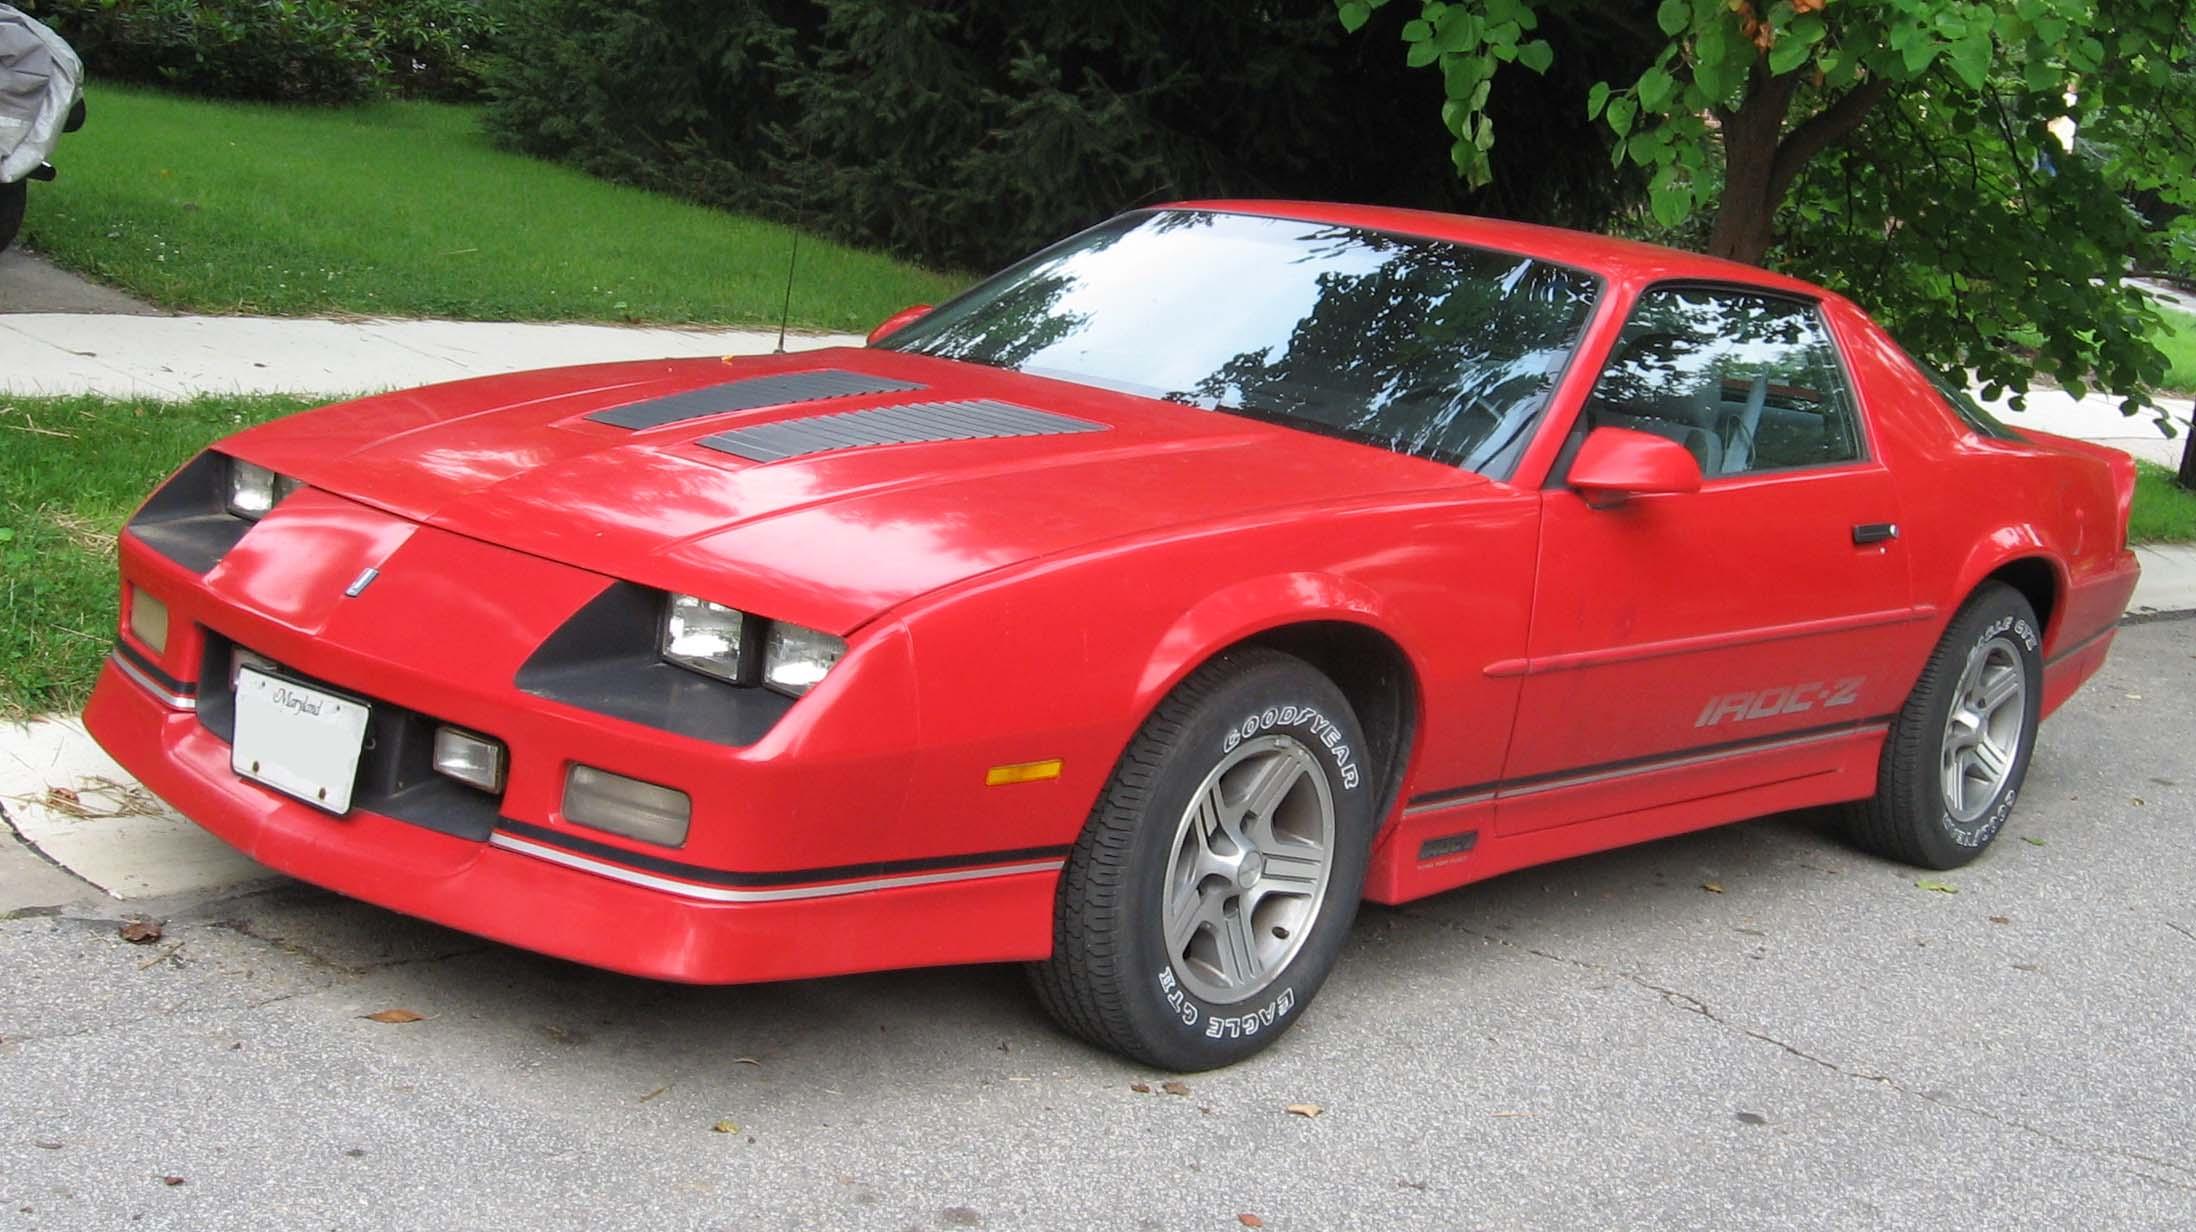 1985 Chevrolet Camaro IROC Z HD Wallpapers 7wallpapersnet 2196x1232